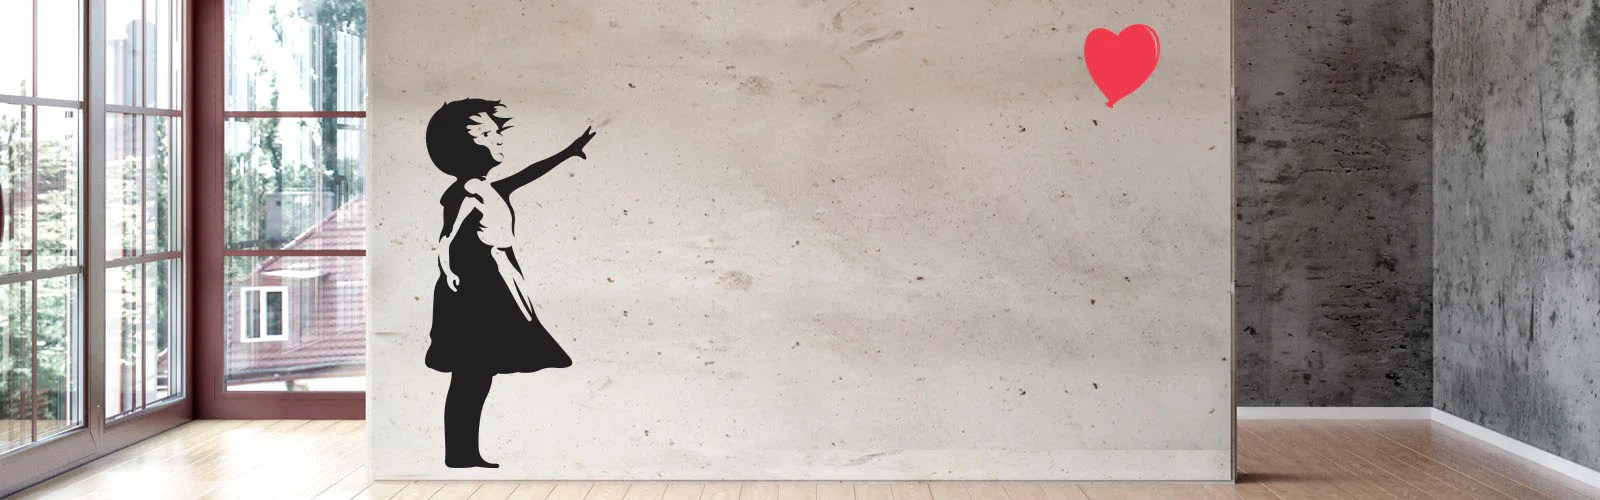 Wallpaper On Bedroom Wall Quotes Banksy Vinyl Wall Decals Wallsneedlove